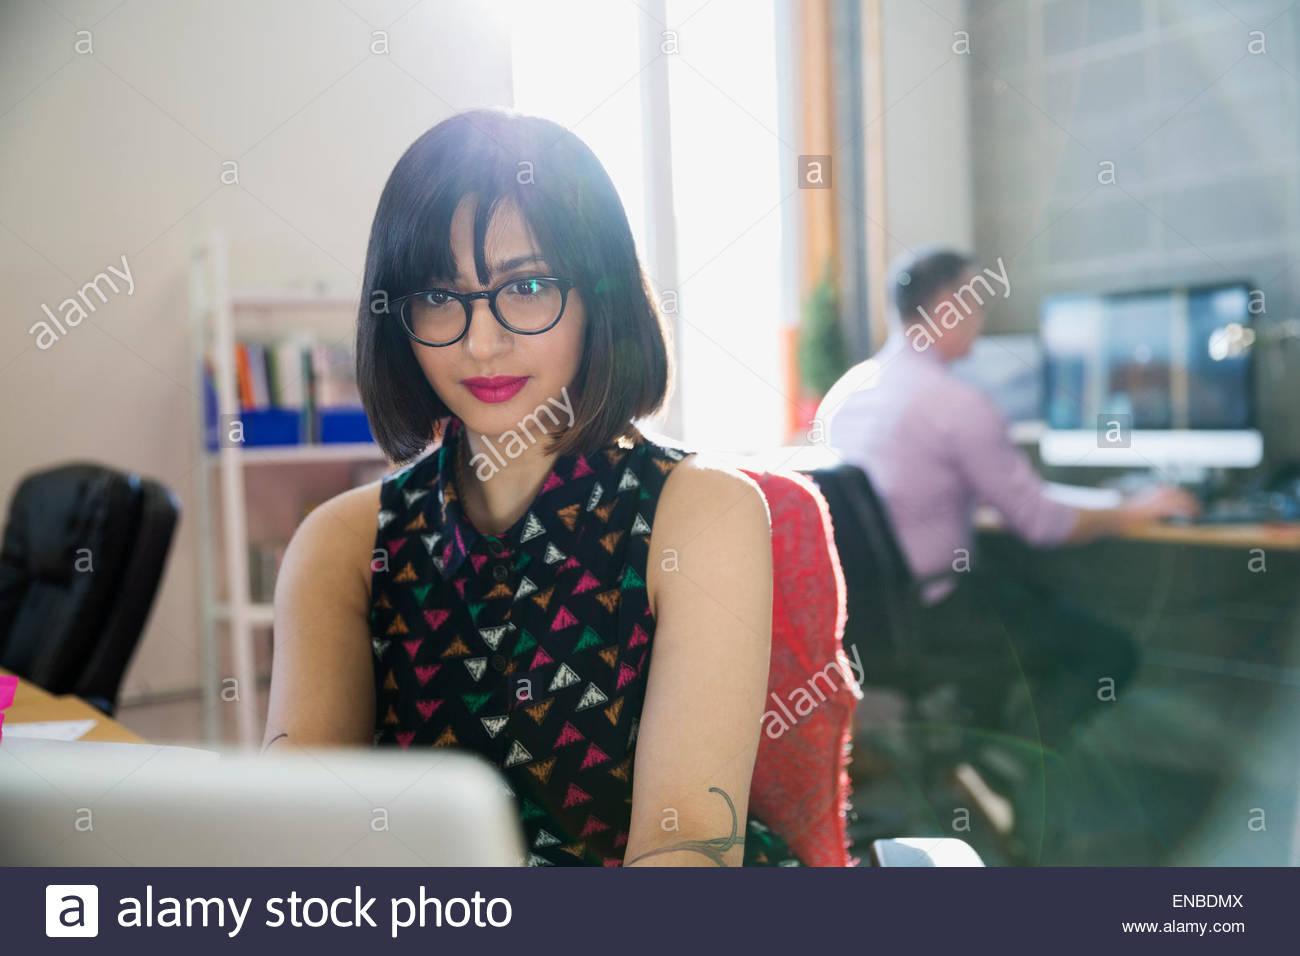 La empresaria trabaja en la oficina de sol Imagen De Stock